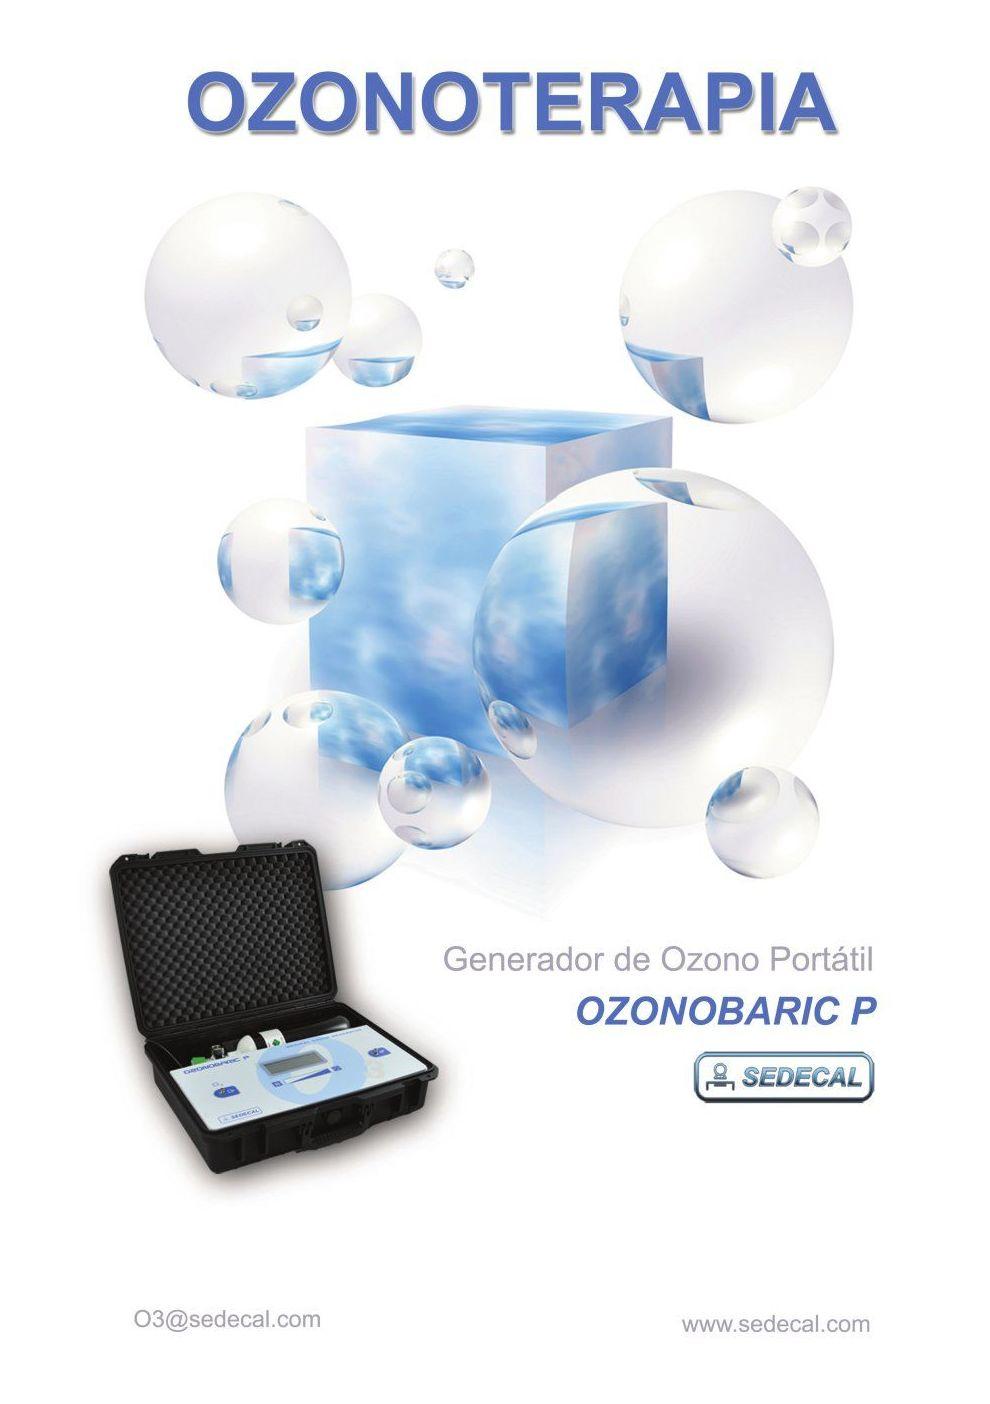 Ozonoterapia: Servicios de Clínica Veterinaria Animalium